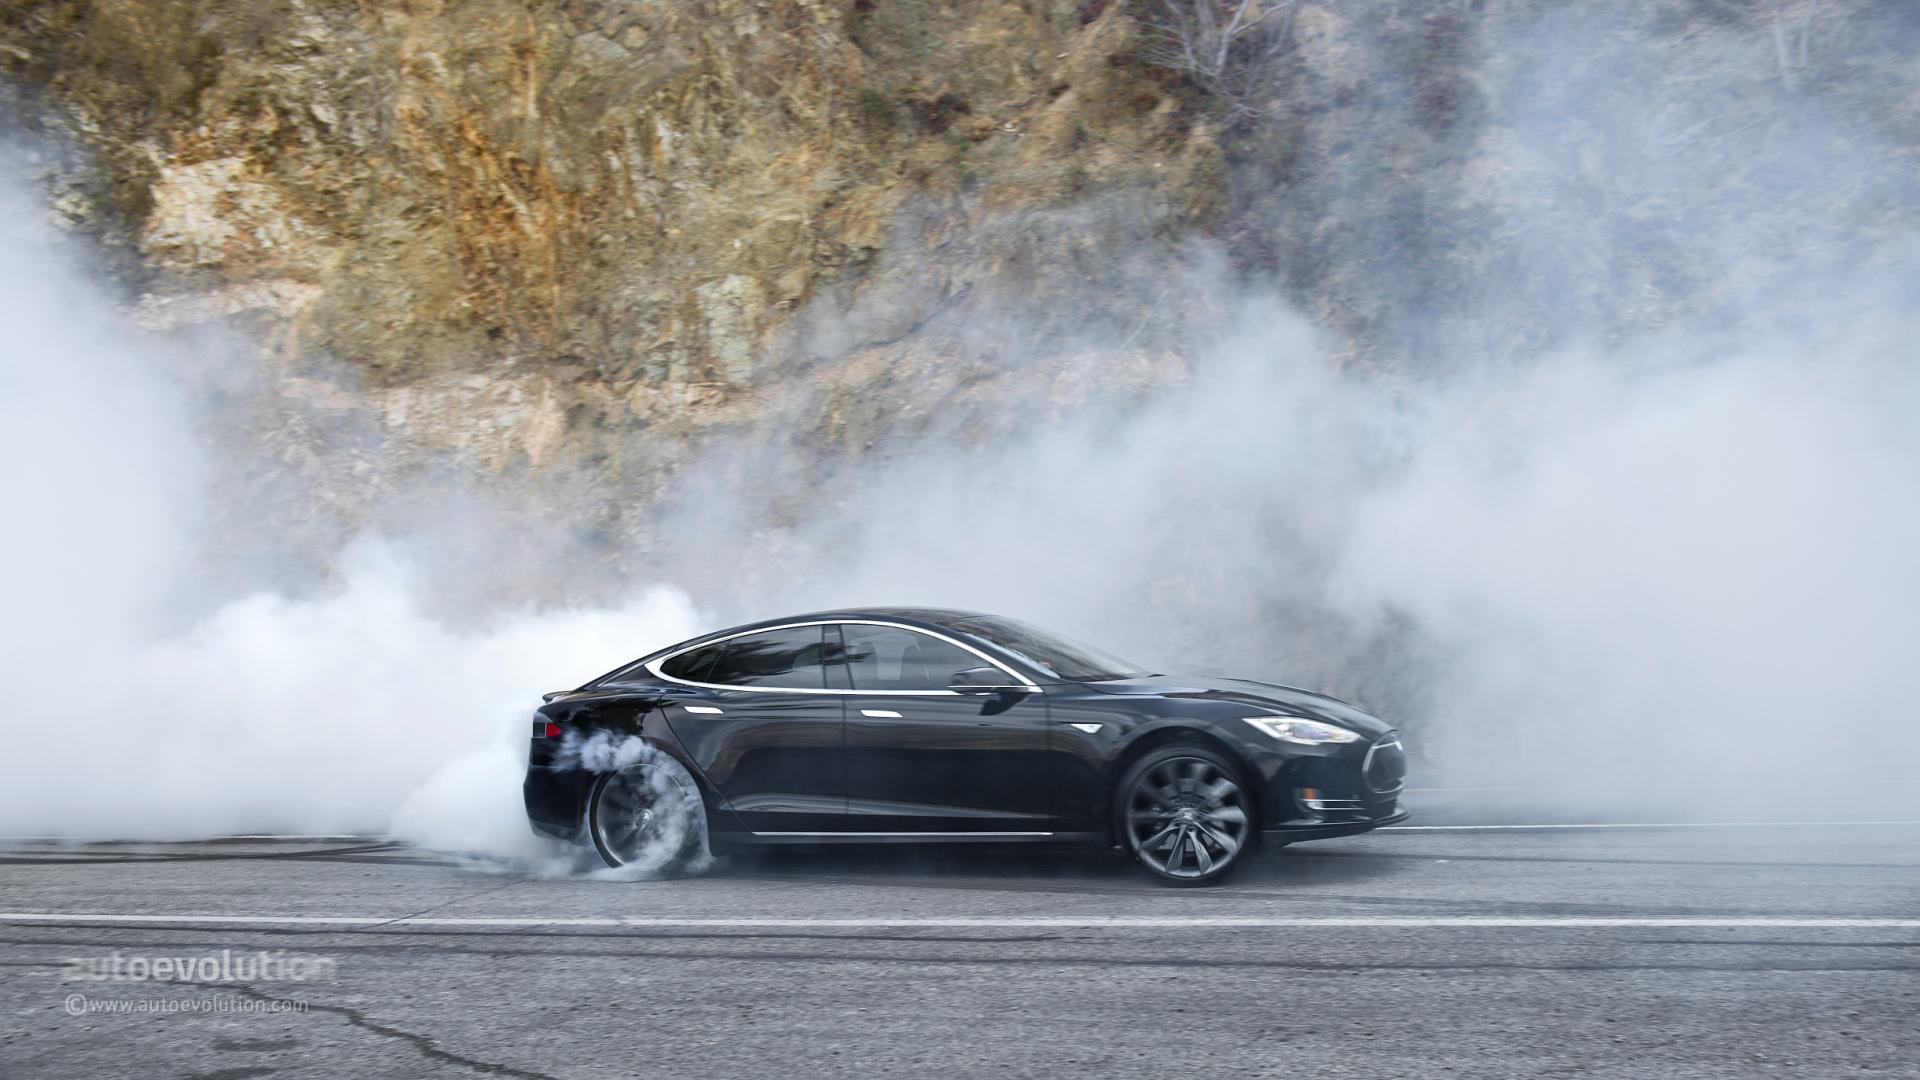 Tesla Model S Doing Monster Burnouts Hd Wallpapers Autoevolution